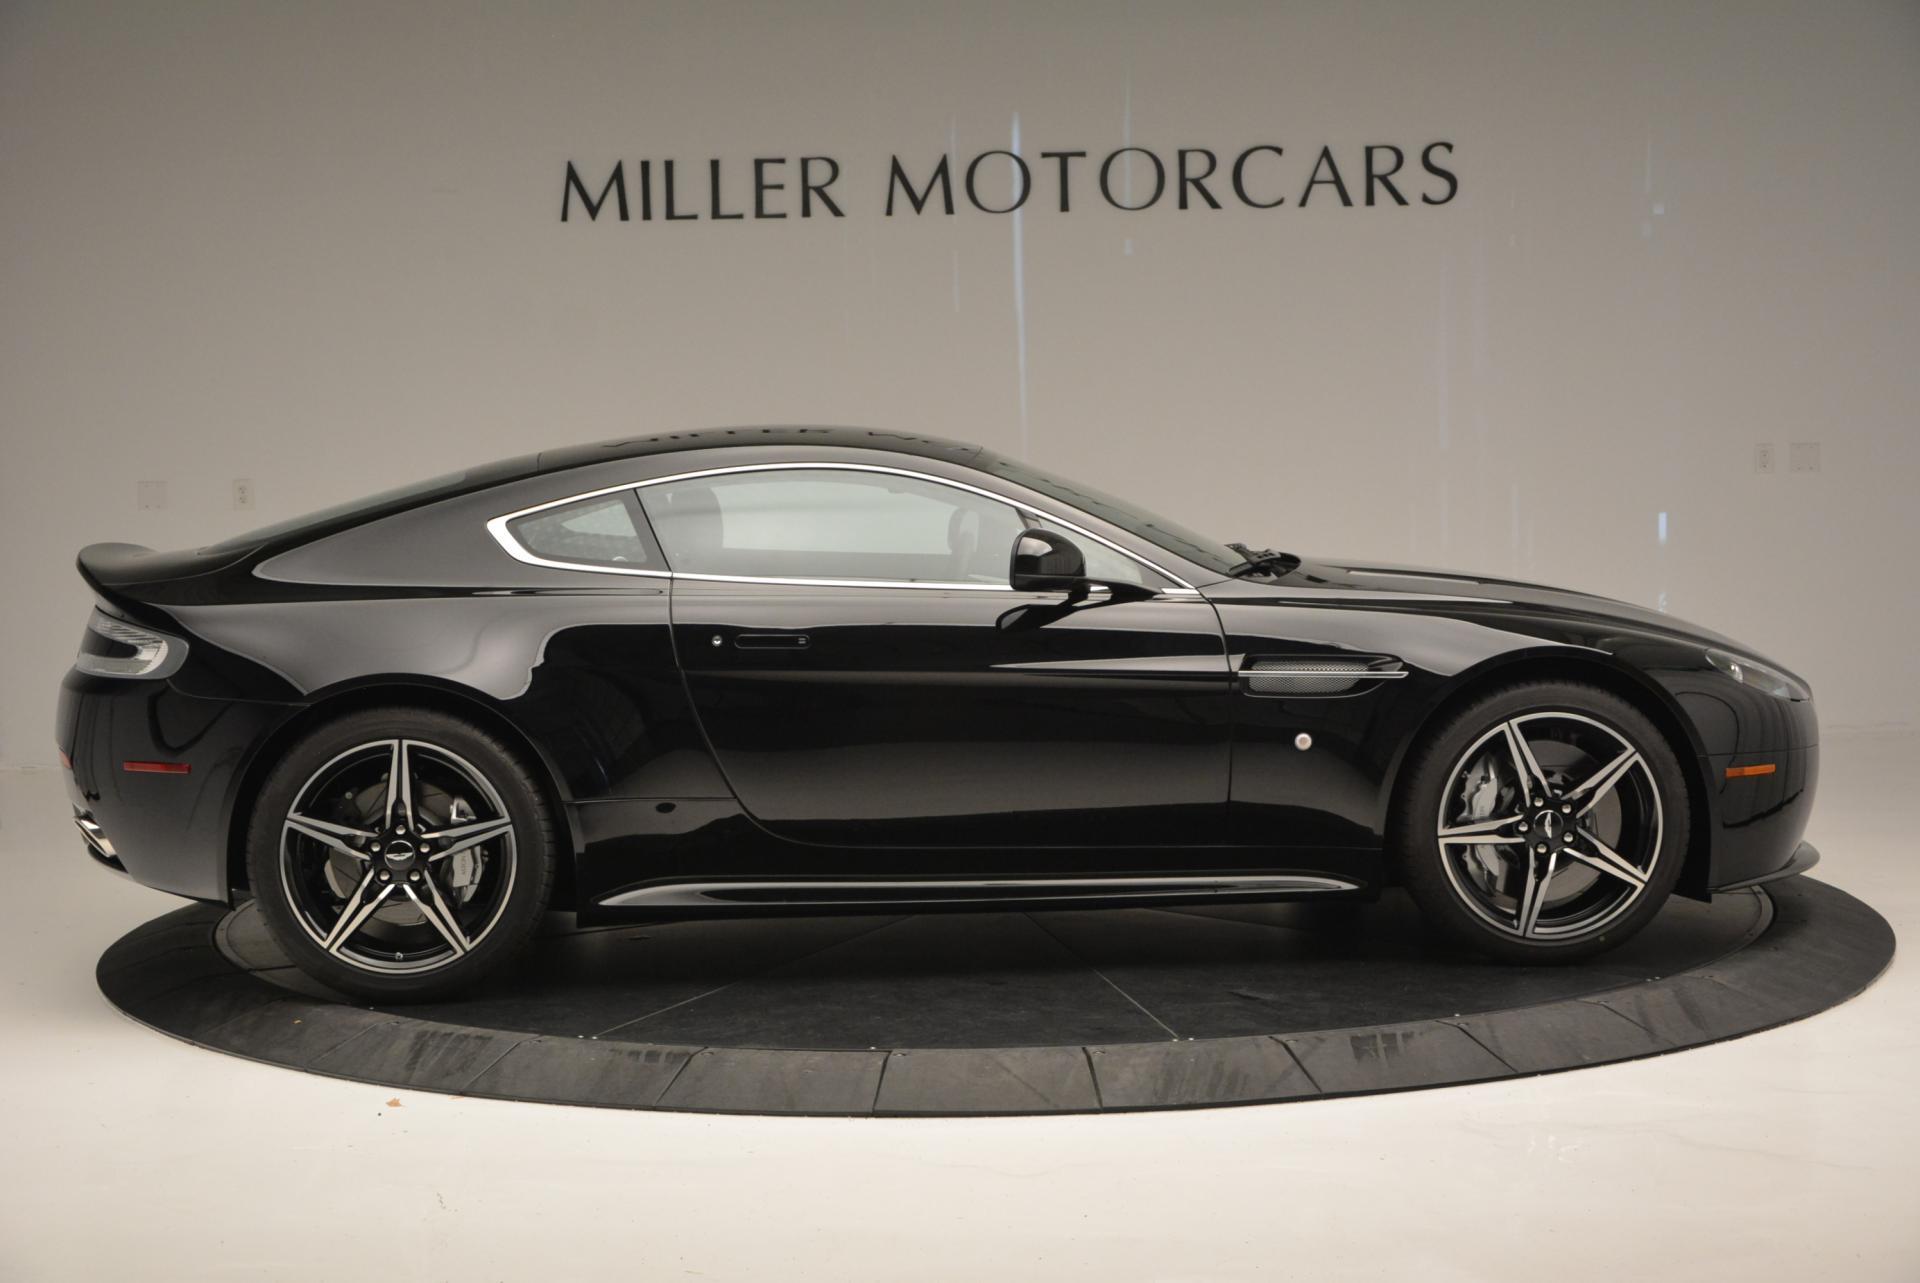 New 2016 Aston Martin V8 Vantage GTS S For Sale In Westport, CT 526_p9